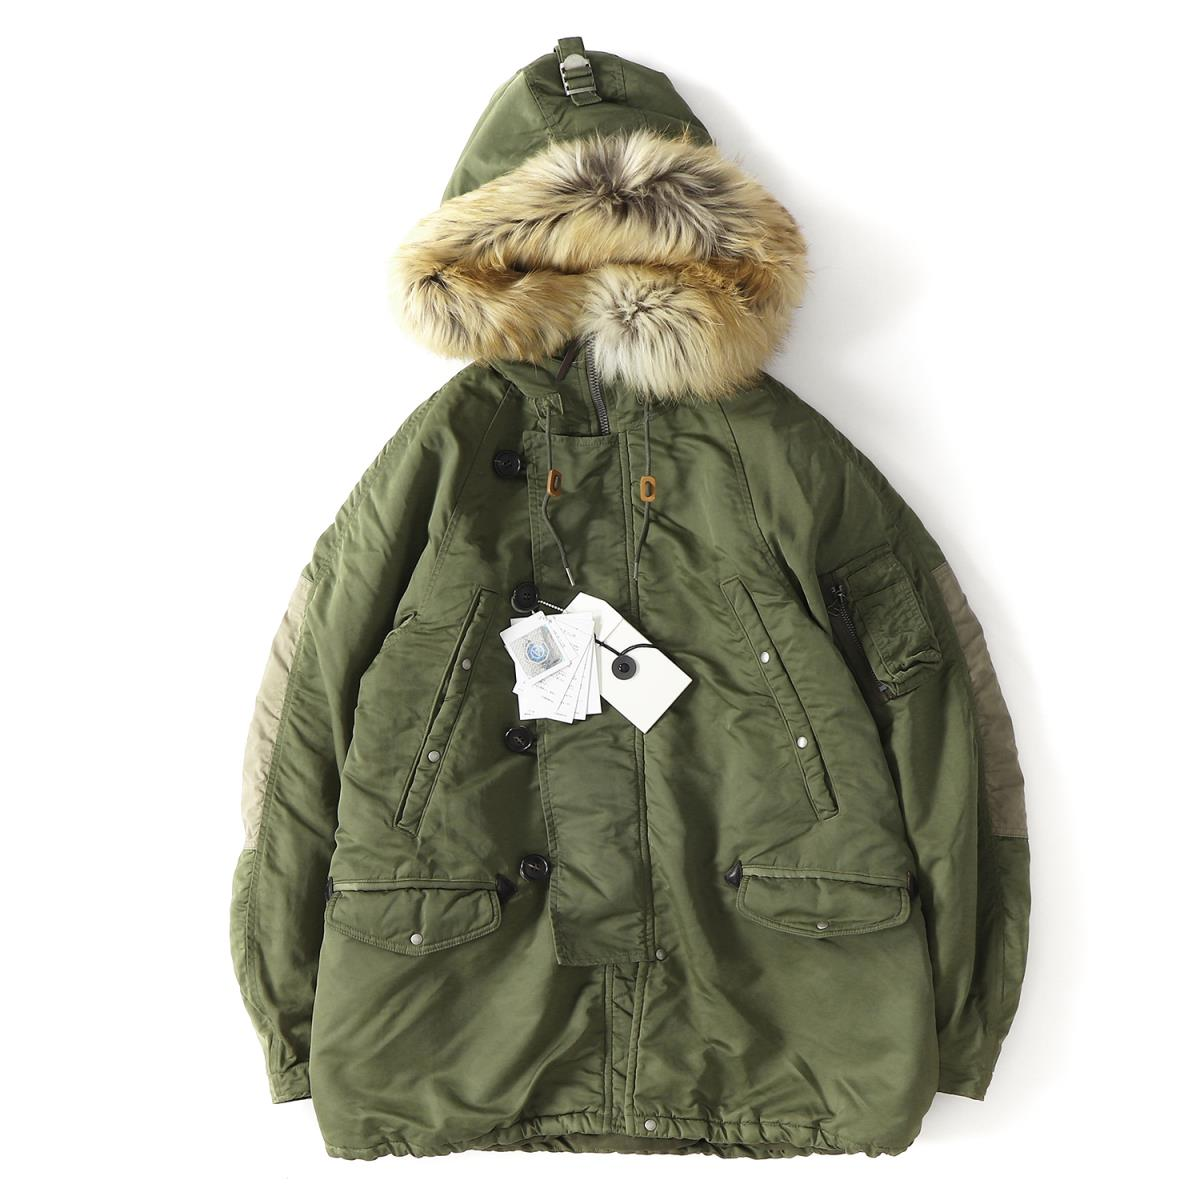 YUNY Mens Pullover Plus Velvet Hood Office Pocket Sweatshirt 3 M